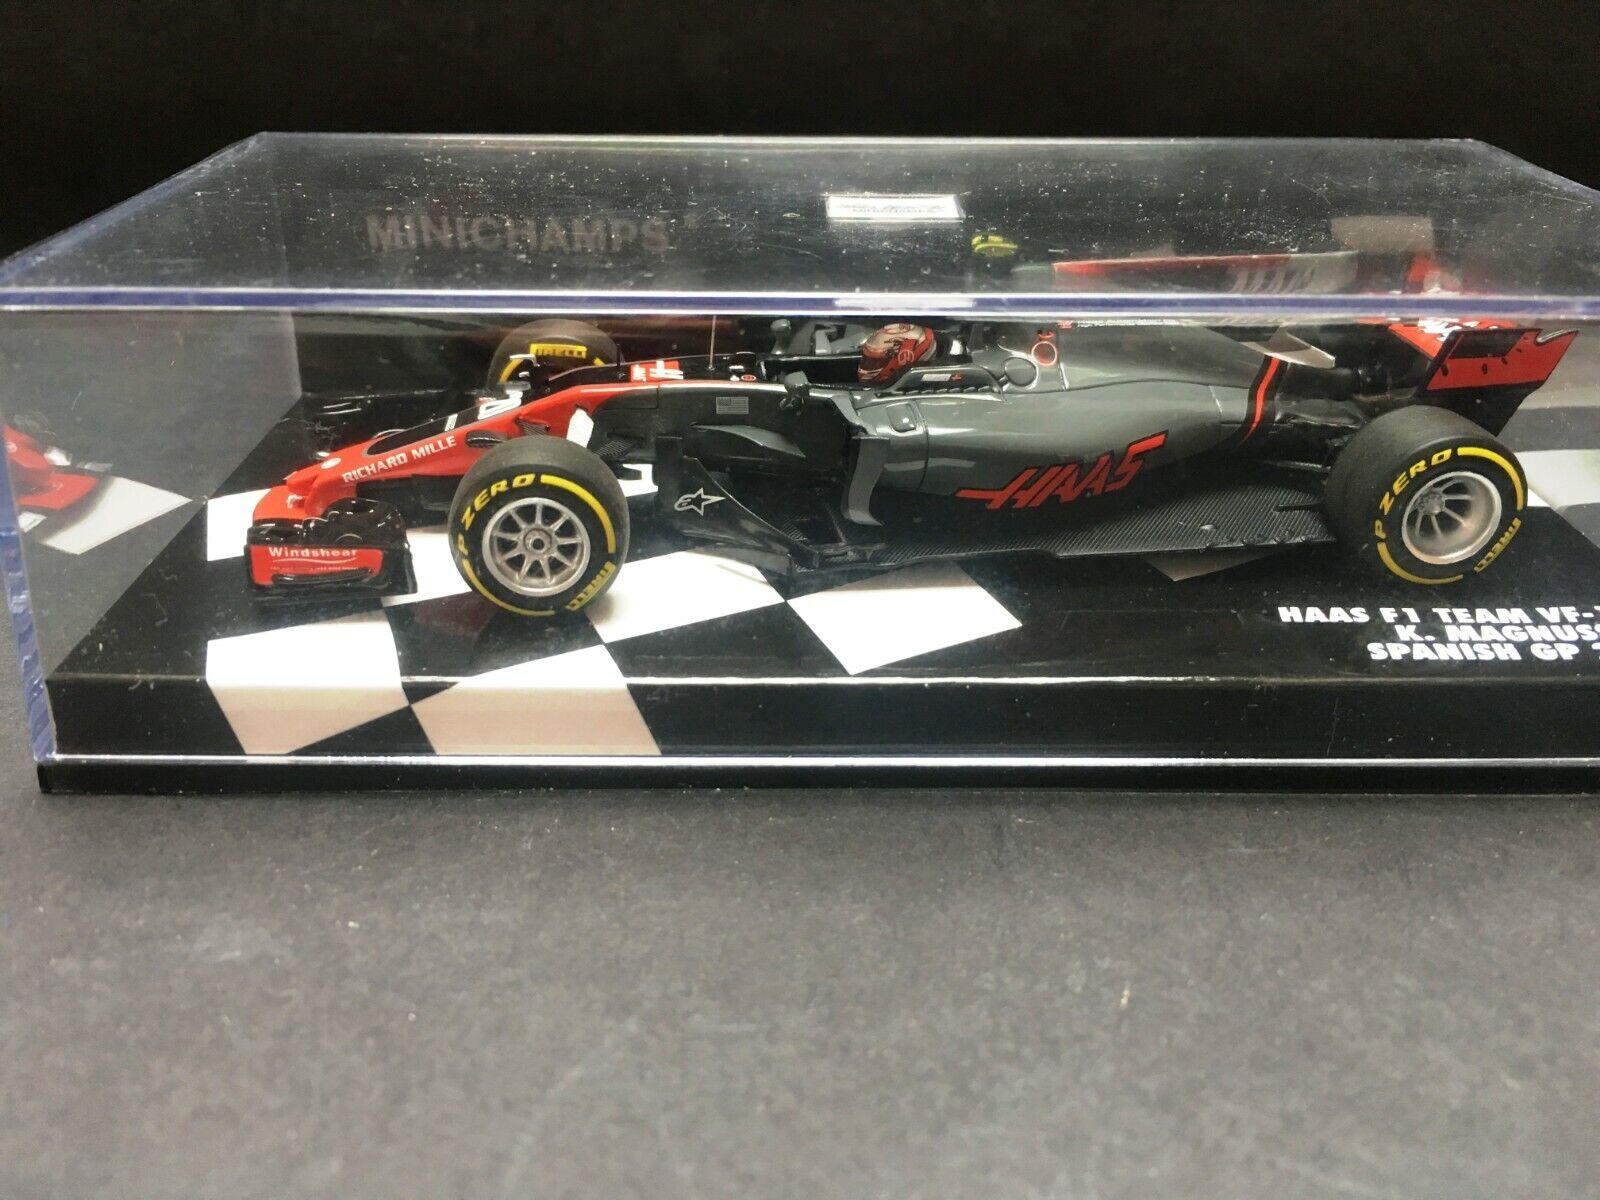 Minichamps - Kevin Magnussen - Haas - VF-17 - 1 43 - 2017 - Spanish GP - Rare